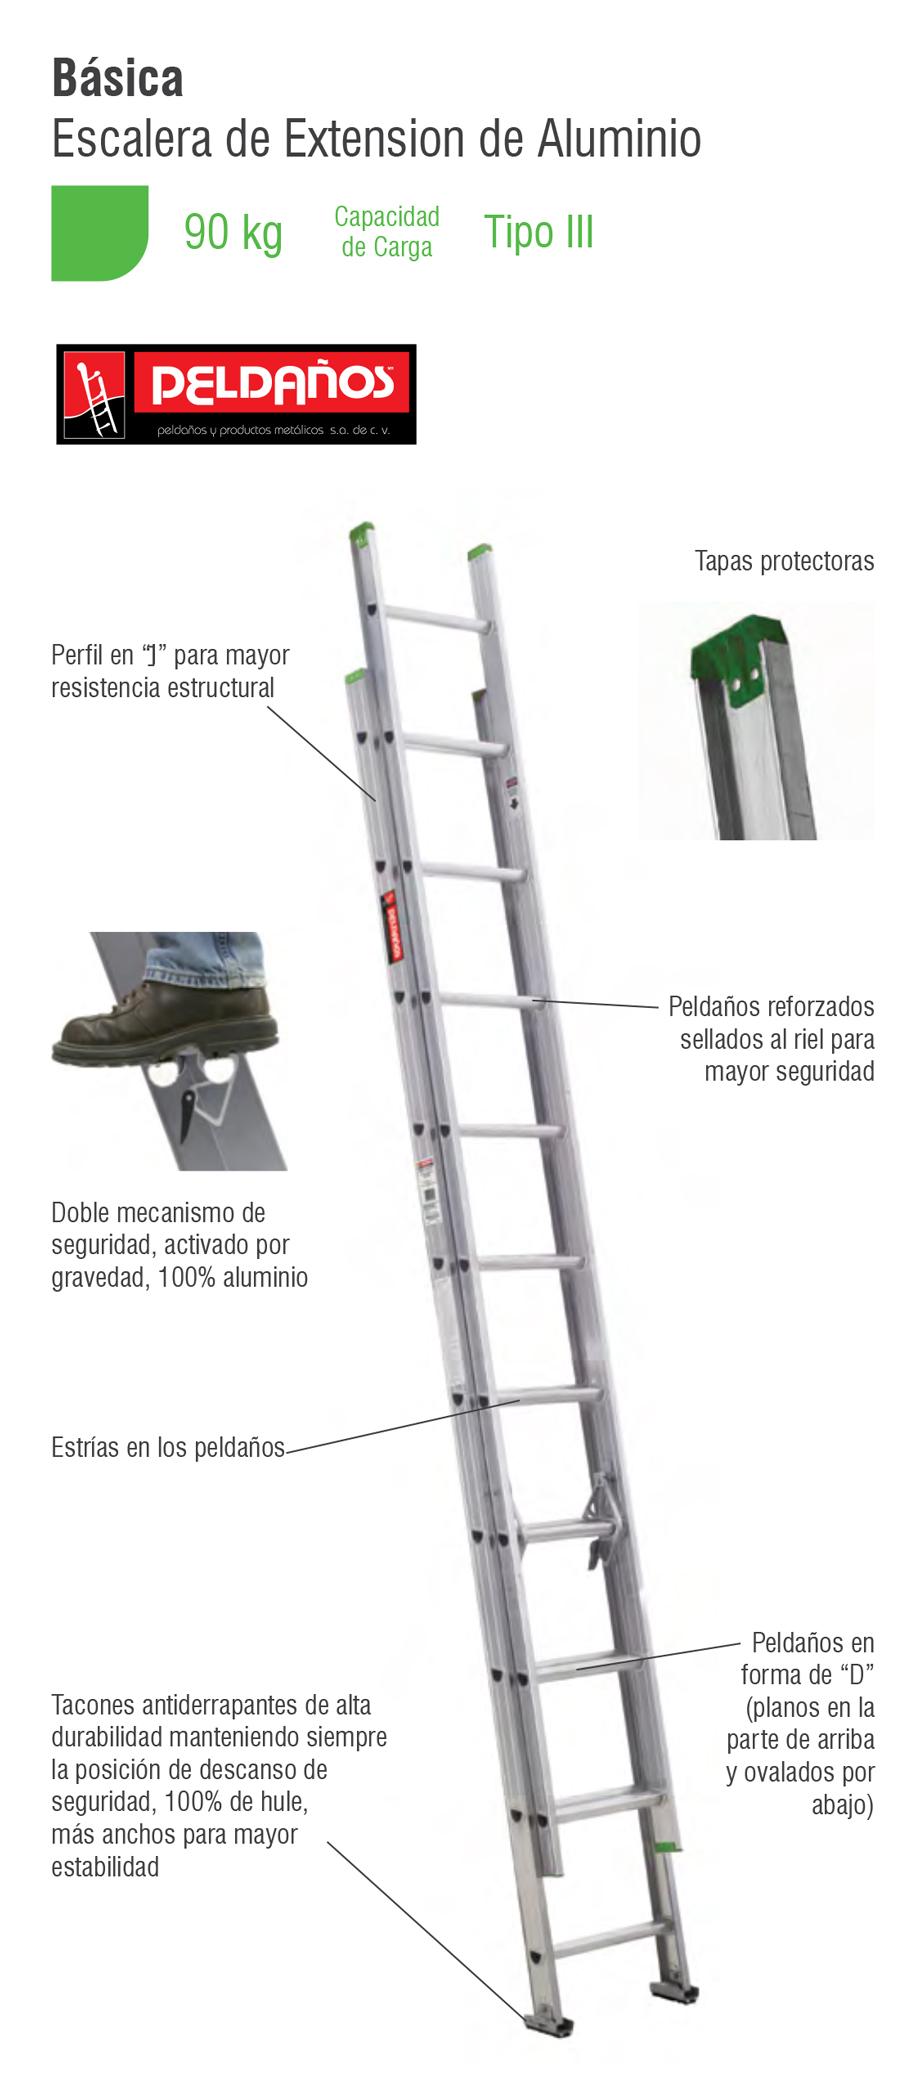 Escalera extensi n aluminio 16 pelda os tipo iii 112316 for Escalera de aluminio extensible 9 metros